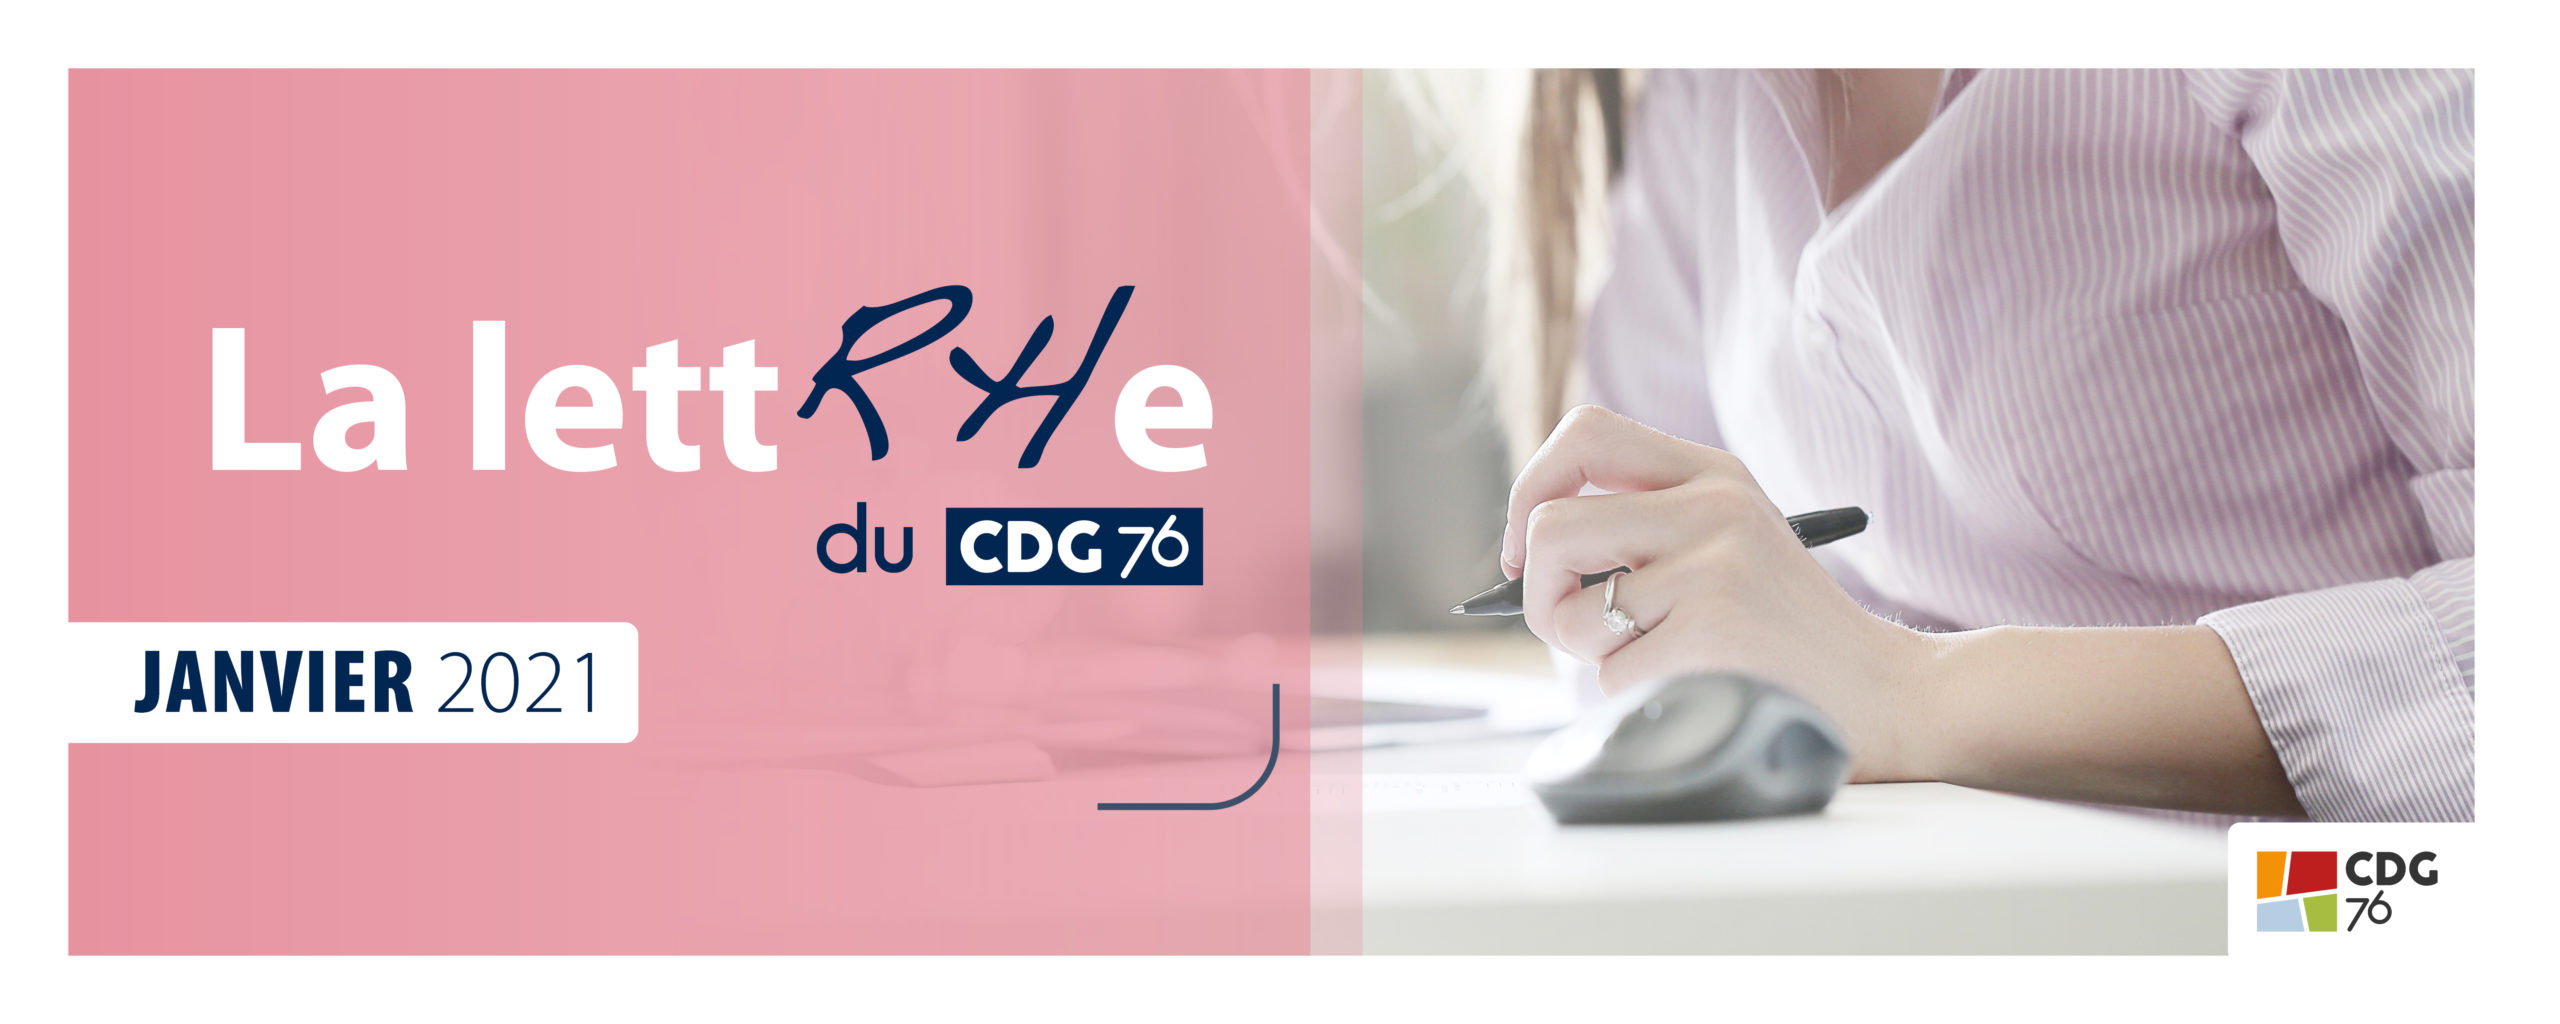 La LettRHe du CDG 76 (janvier 2021)